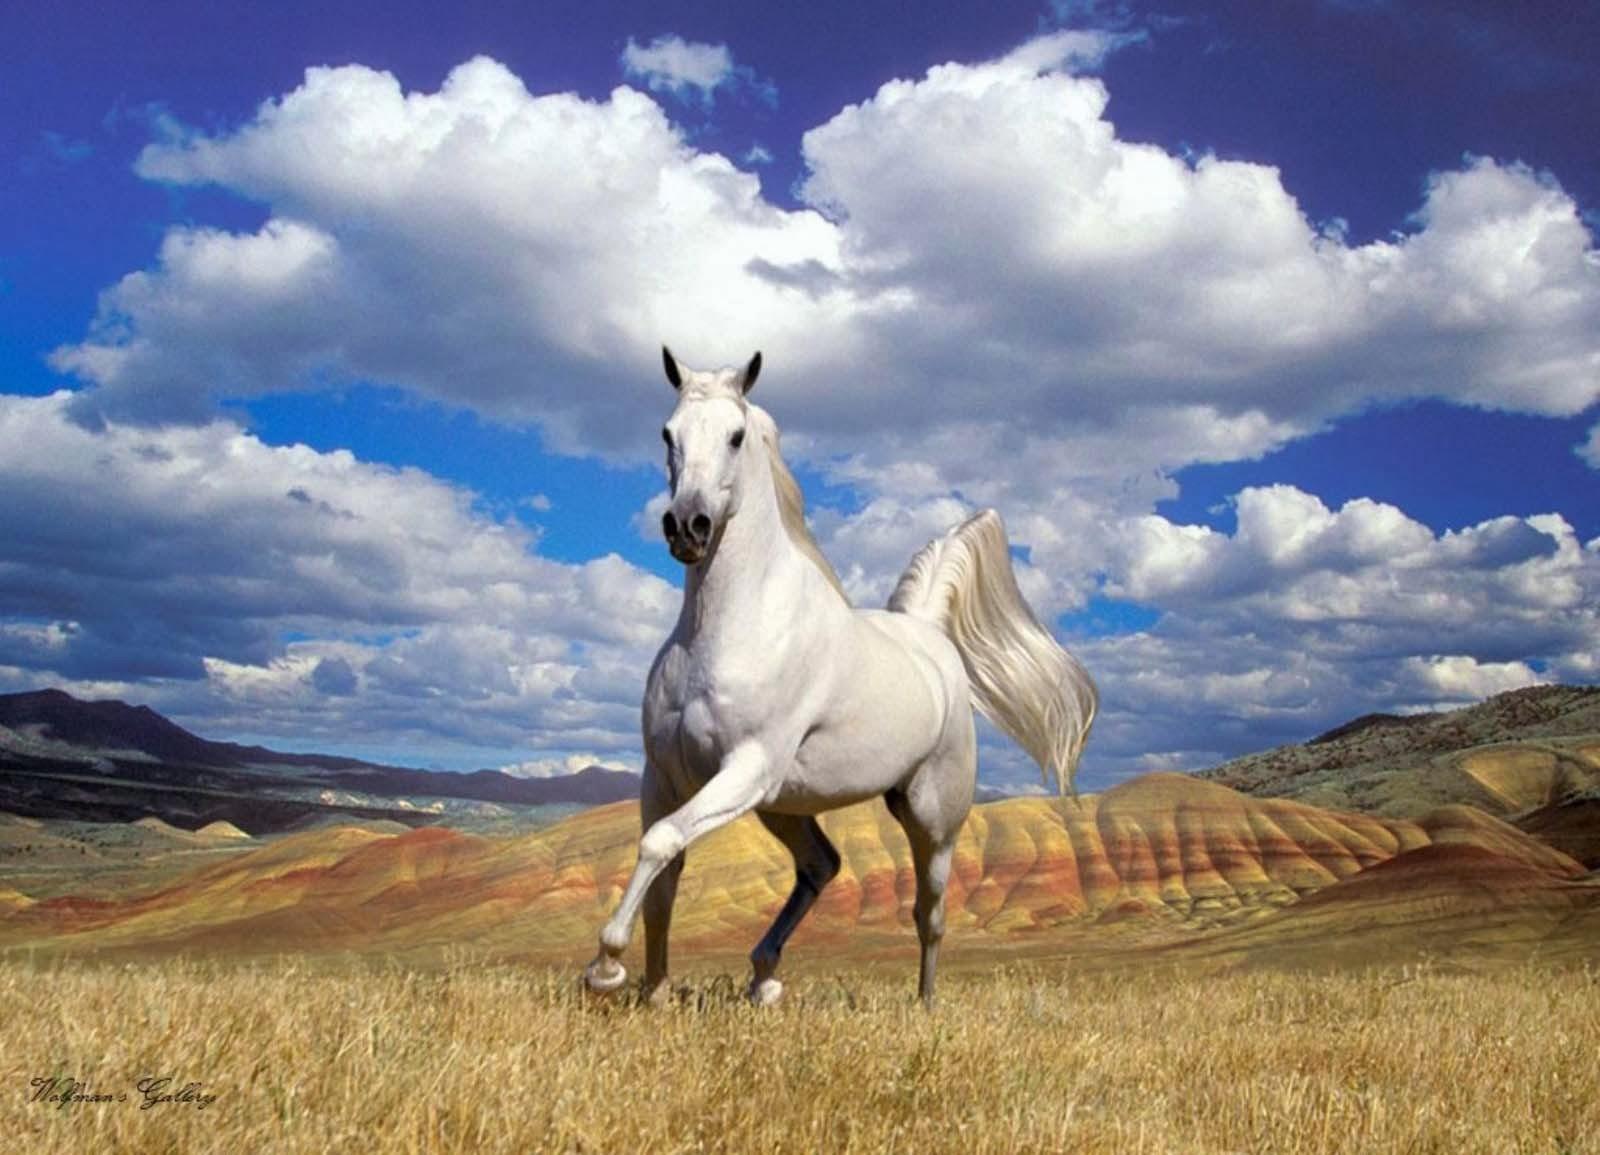 Great   Wallpaper Horse Spring - appaloosa+horse+horse+wallpaper  Picture_808927.jpg